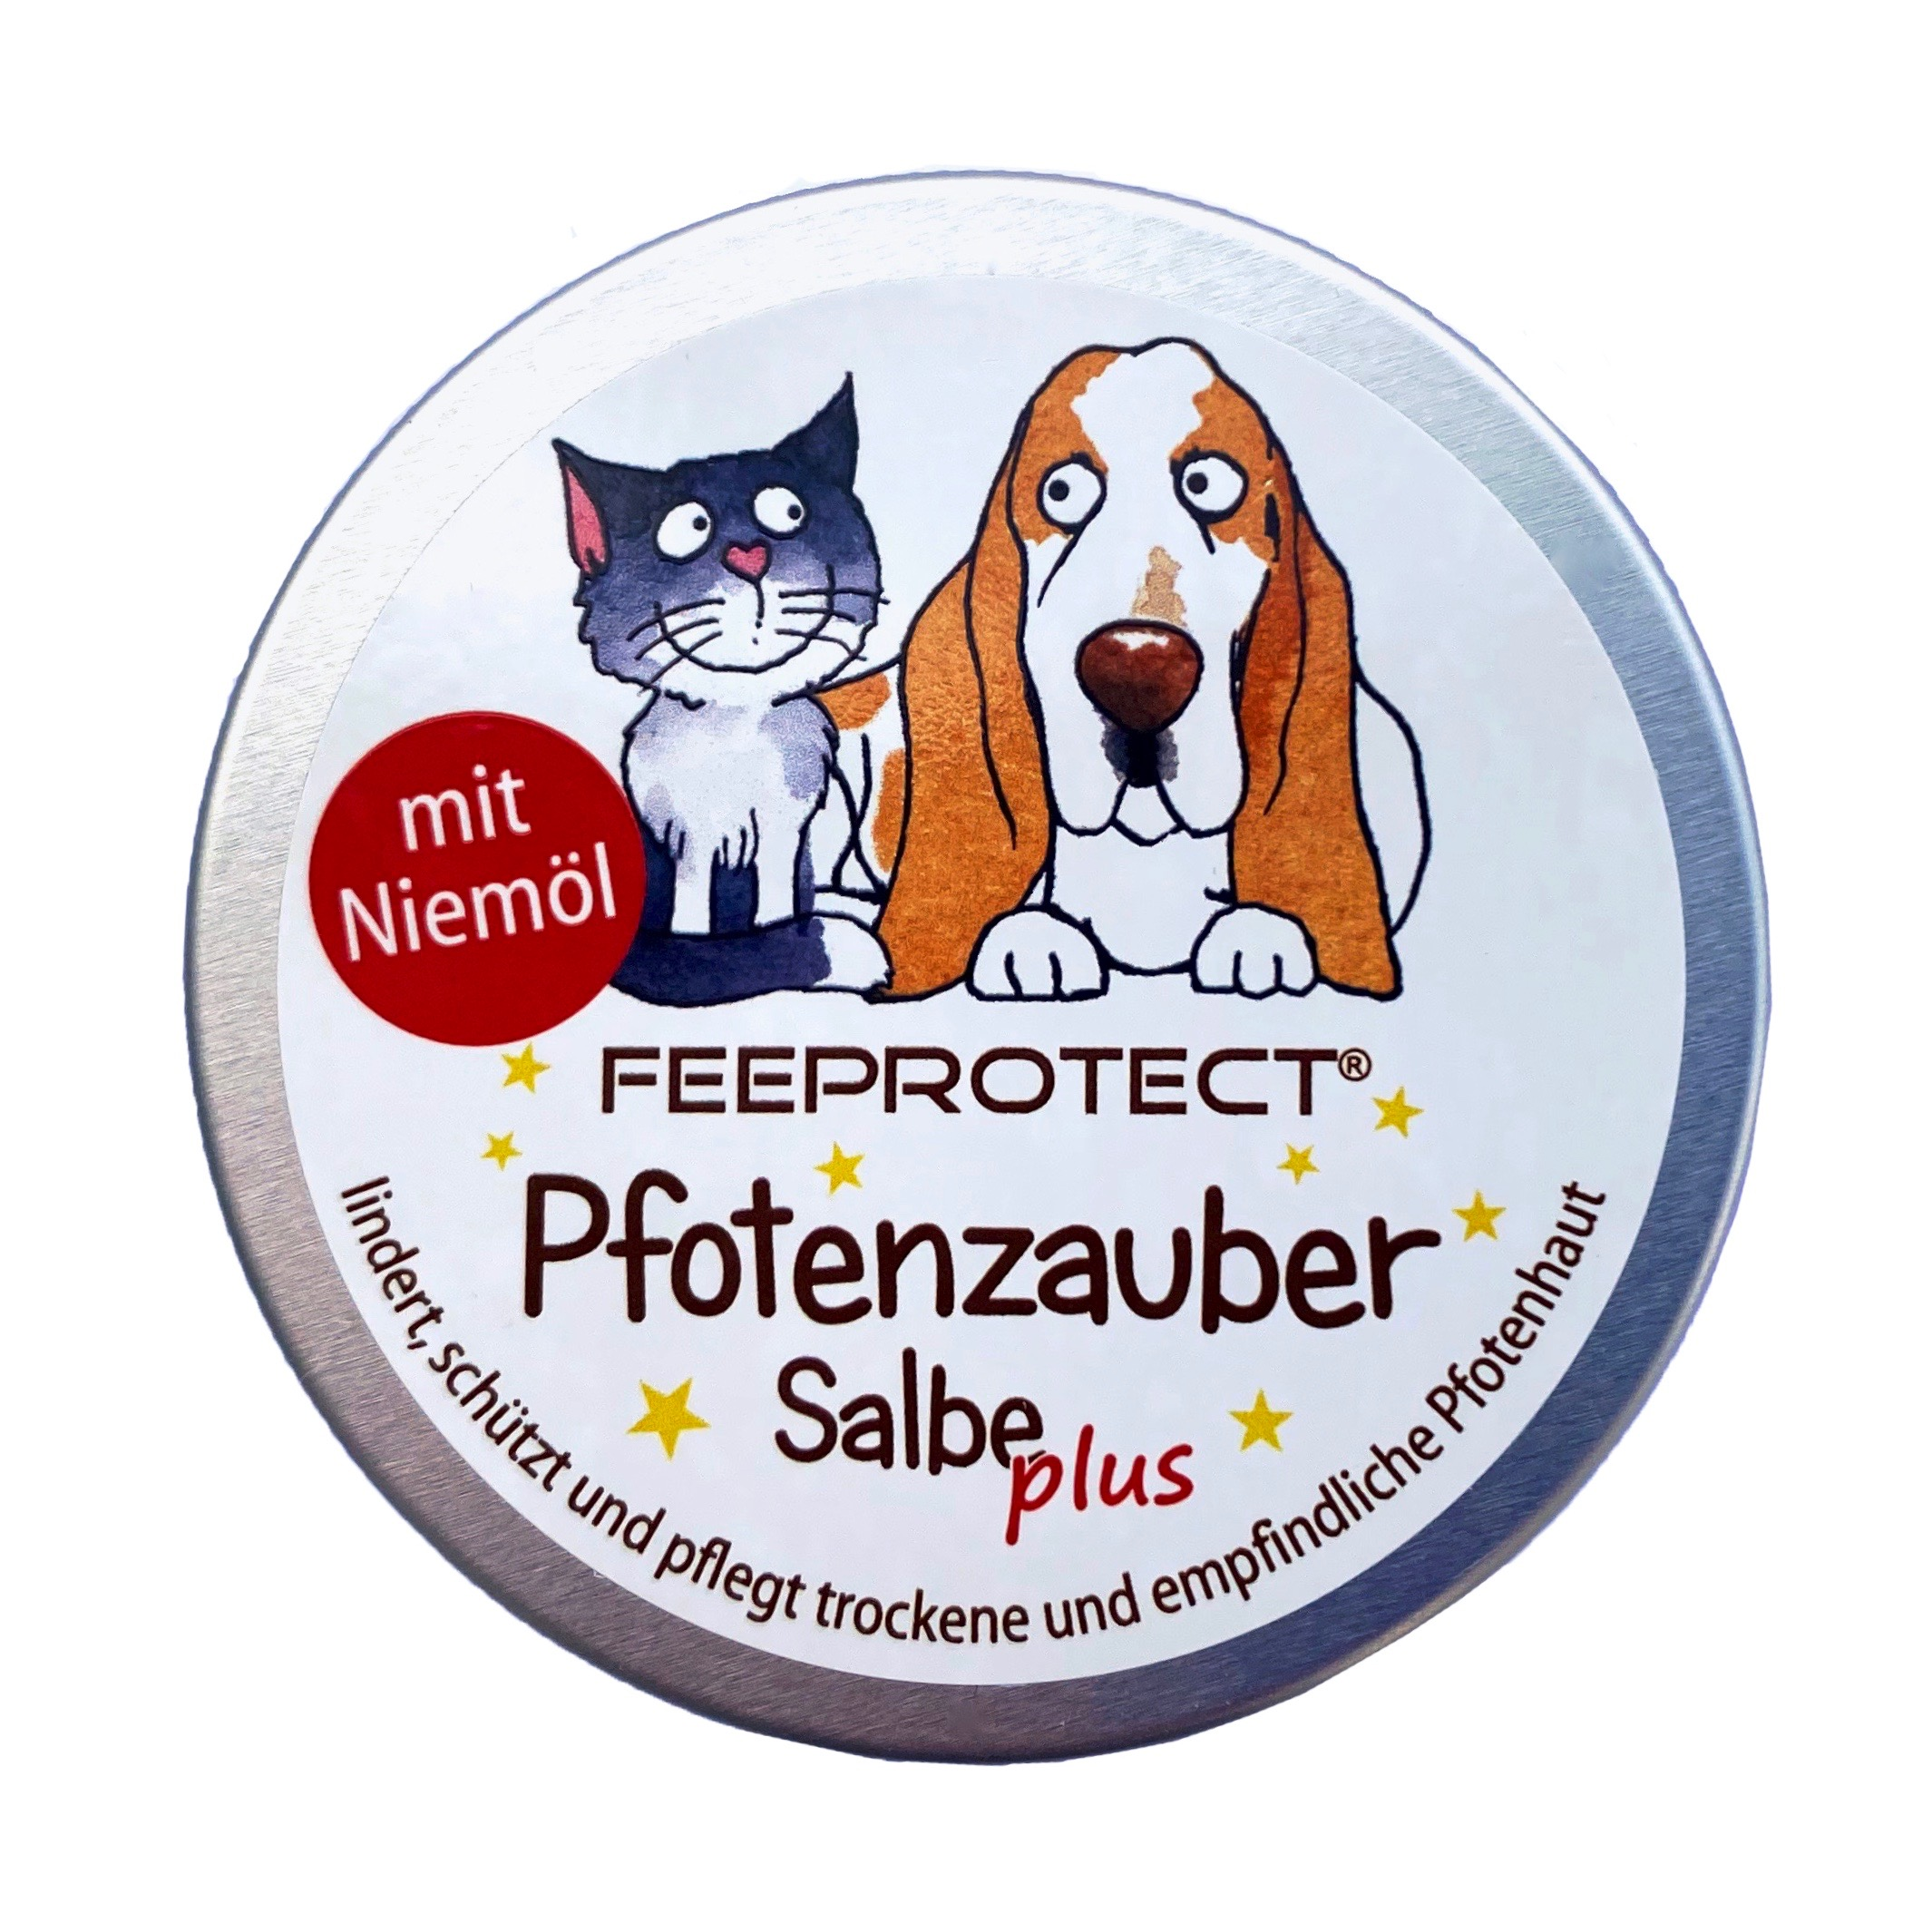 Feeprotect ® Pfotenzauber-Salbe mit Niemöl Aludose